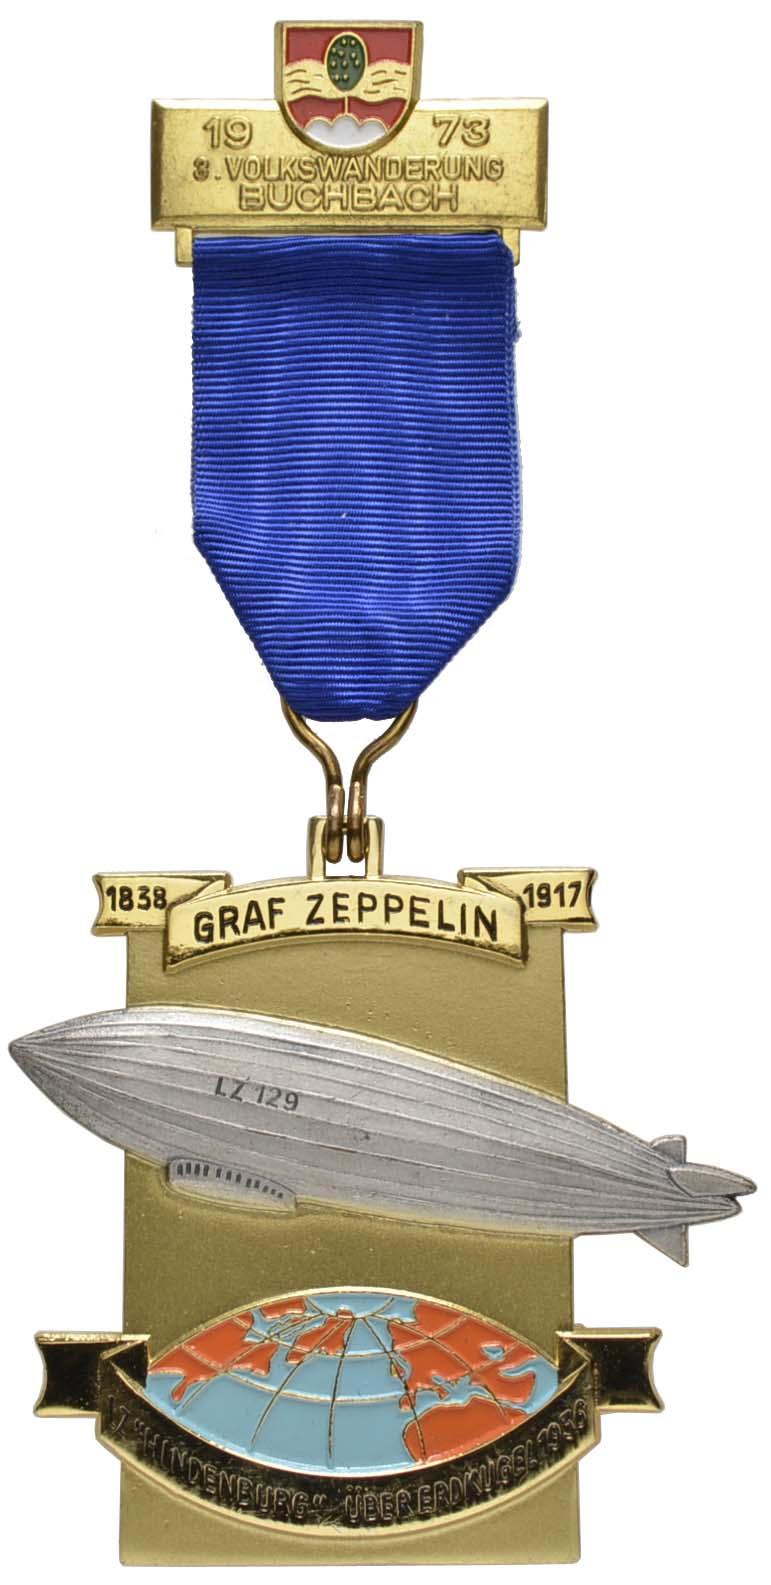 Lot 2326 - medaillen Sonstige Medaillen - Zeppelin -  Auktionshaus Ulrich Felzmann GmbH & Co. KG Coins single lots